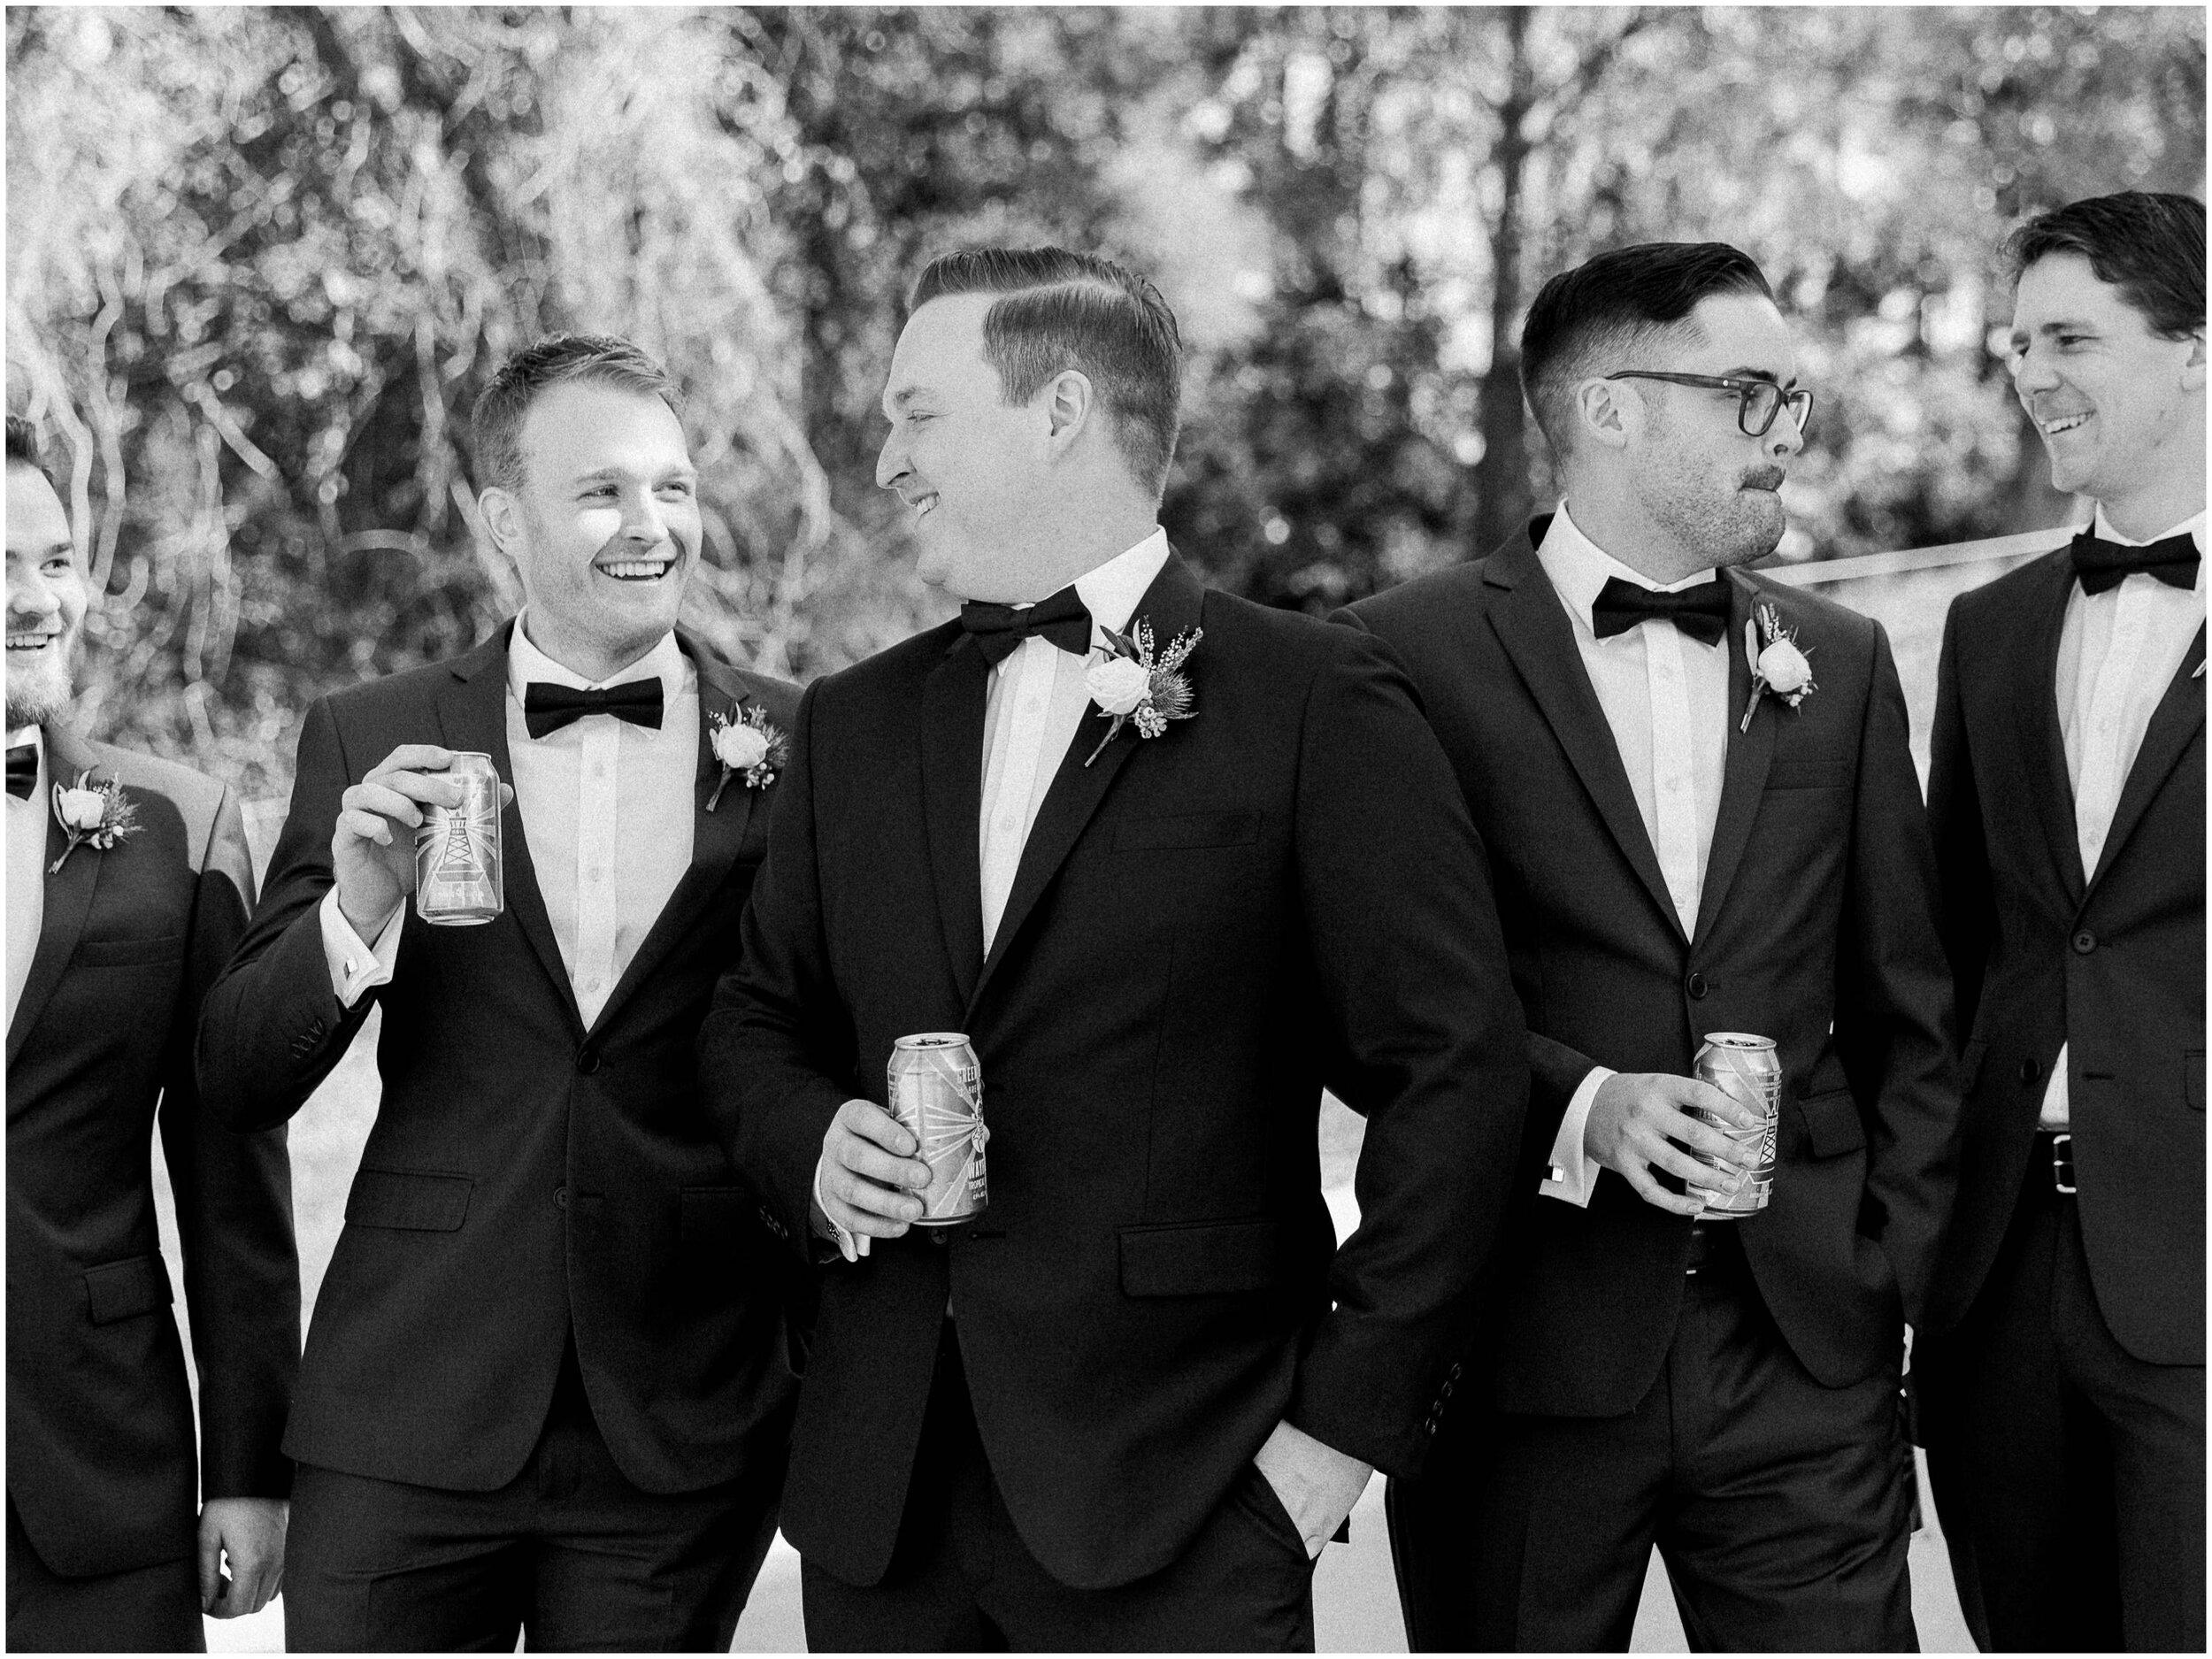 brisbane-film-wedding-photographer-lauren-olivia-luxury-wedding-australia-01-04.jpg